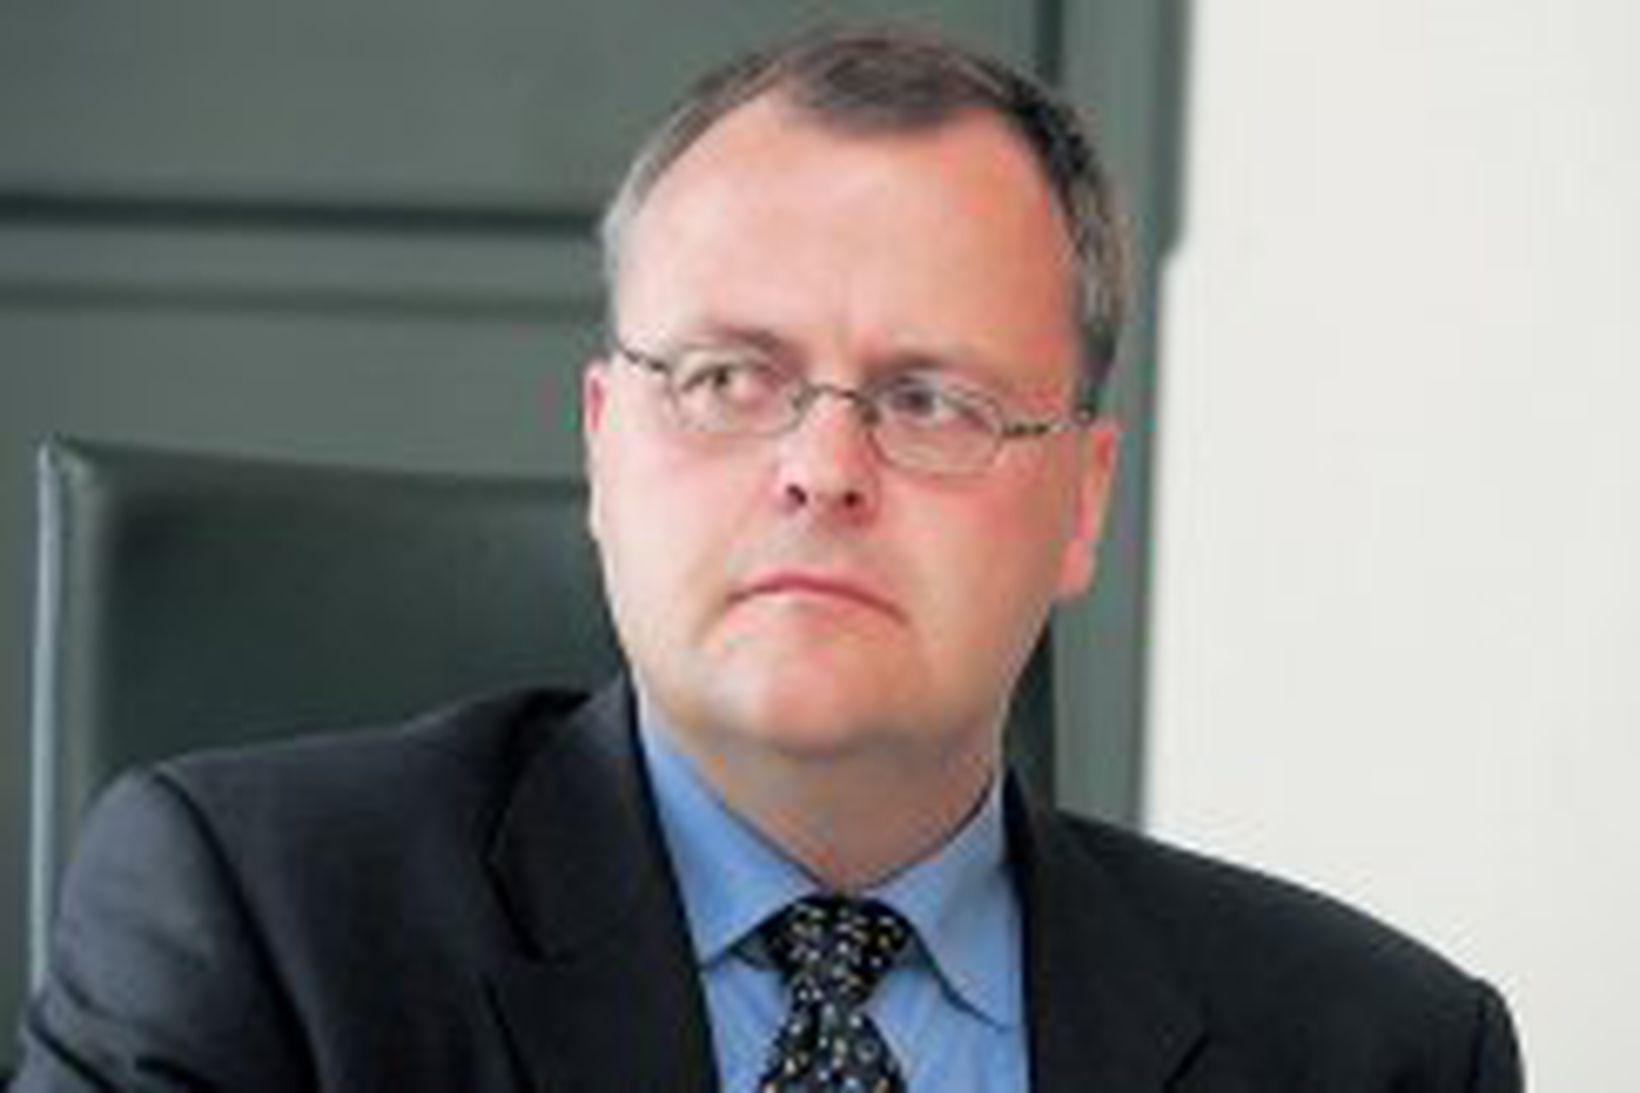 Gylfi Magnússon